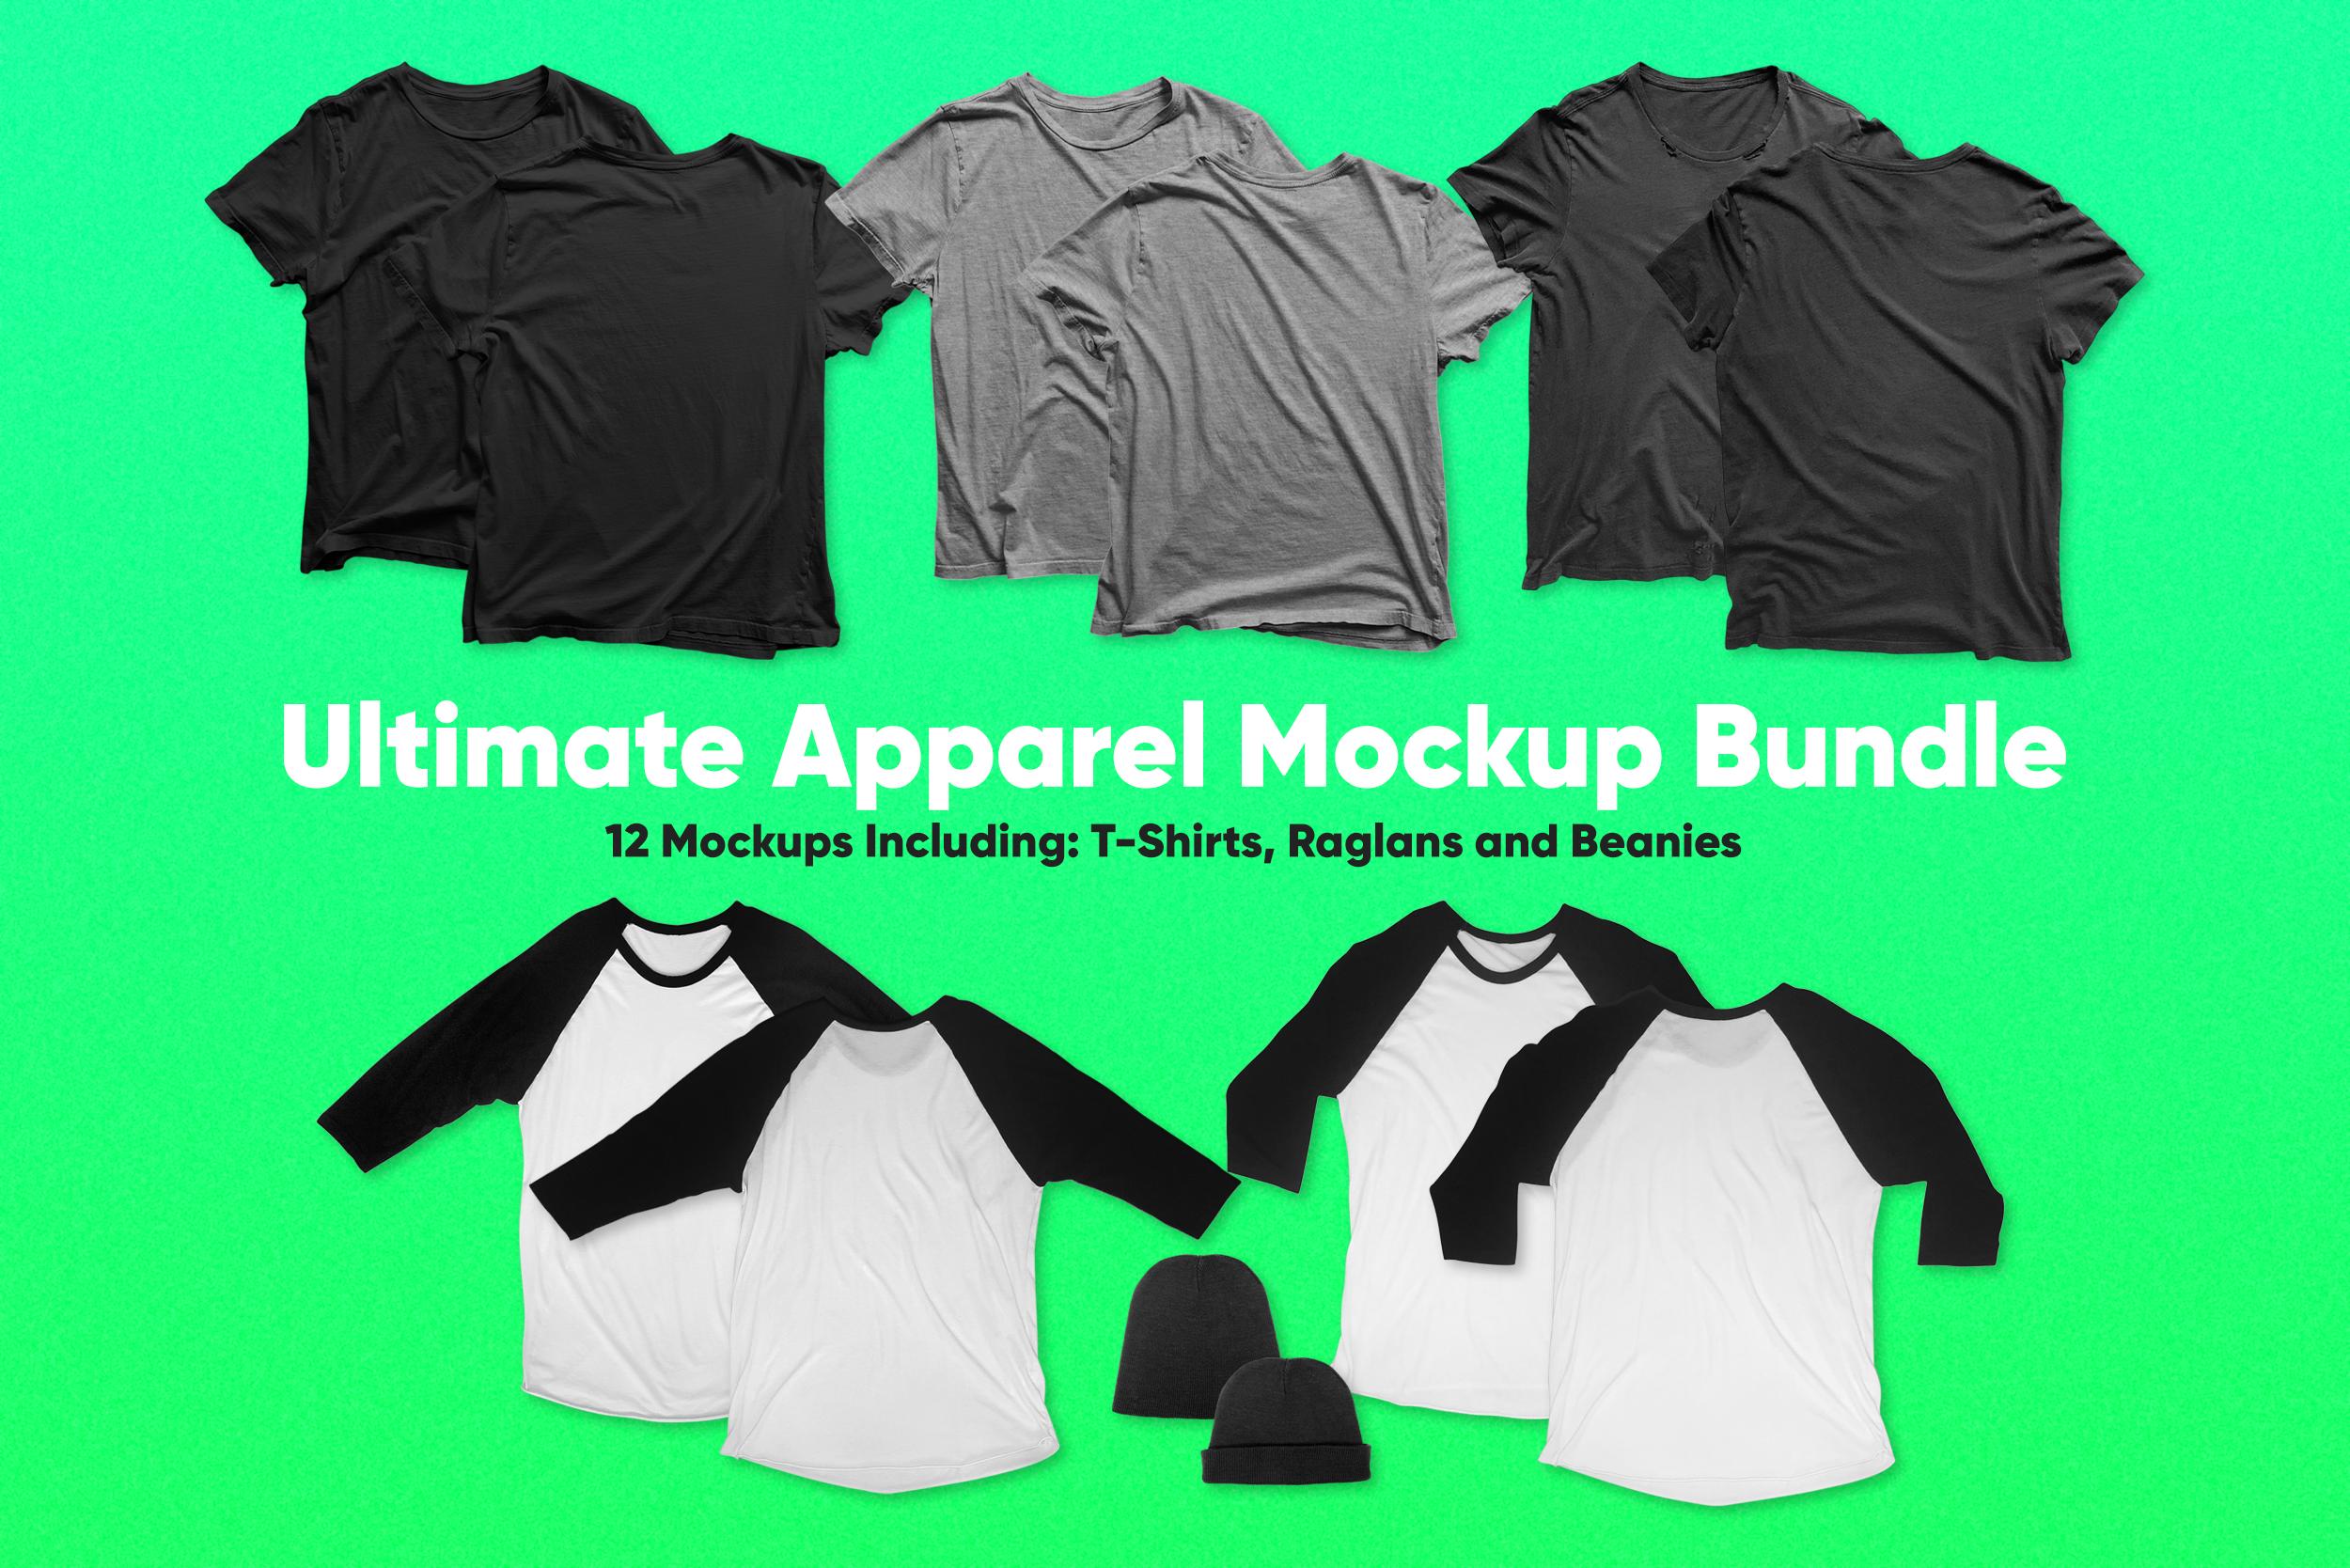 Download Ultimate Apparel Mockup Bundle Clothing Mockup Shirt Mockup Tshirt Mockup